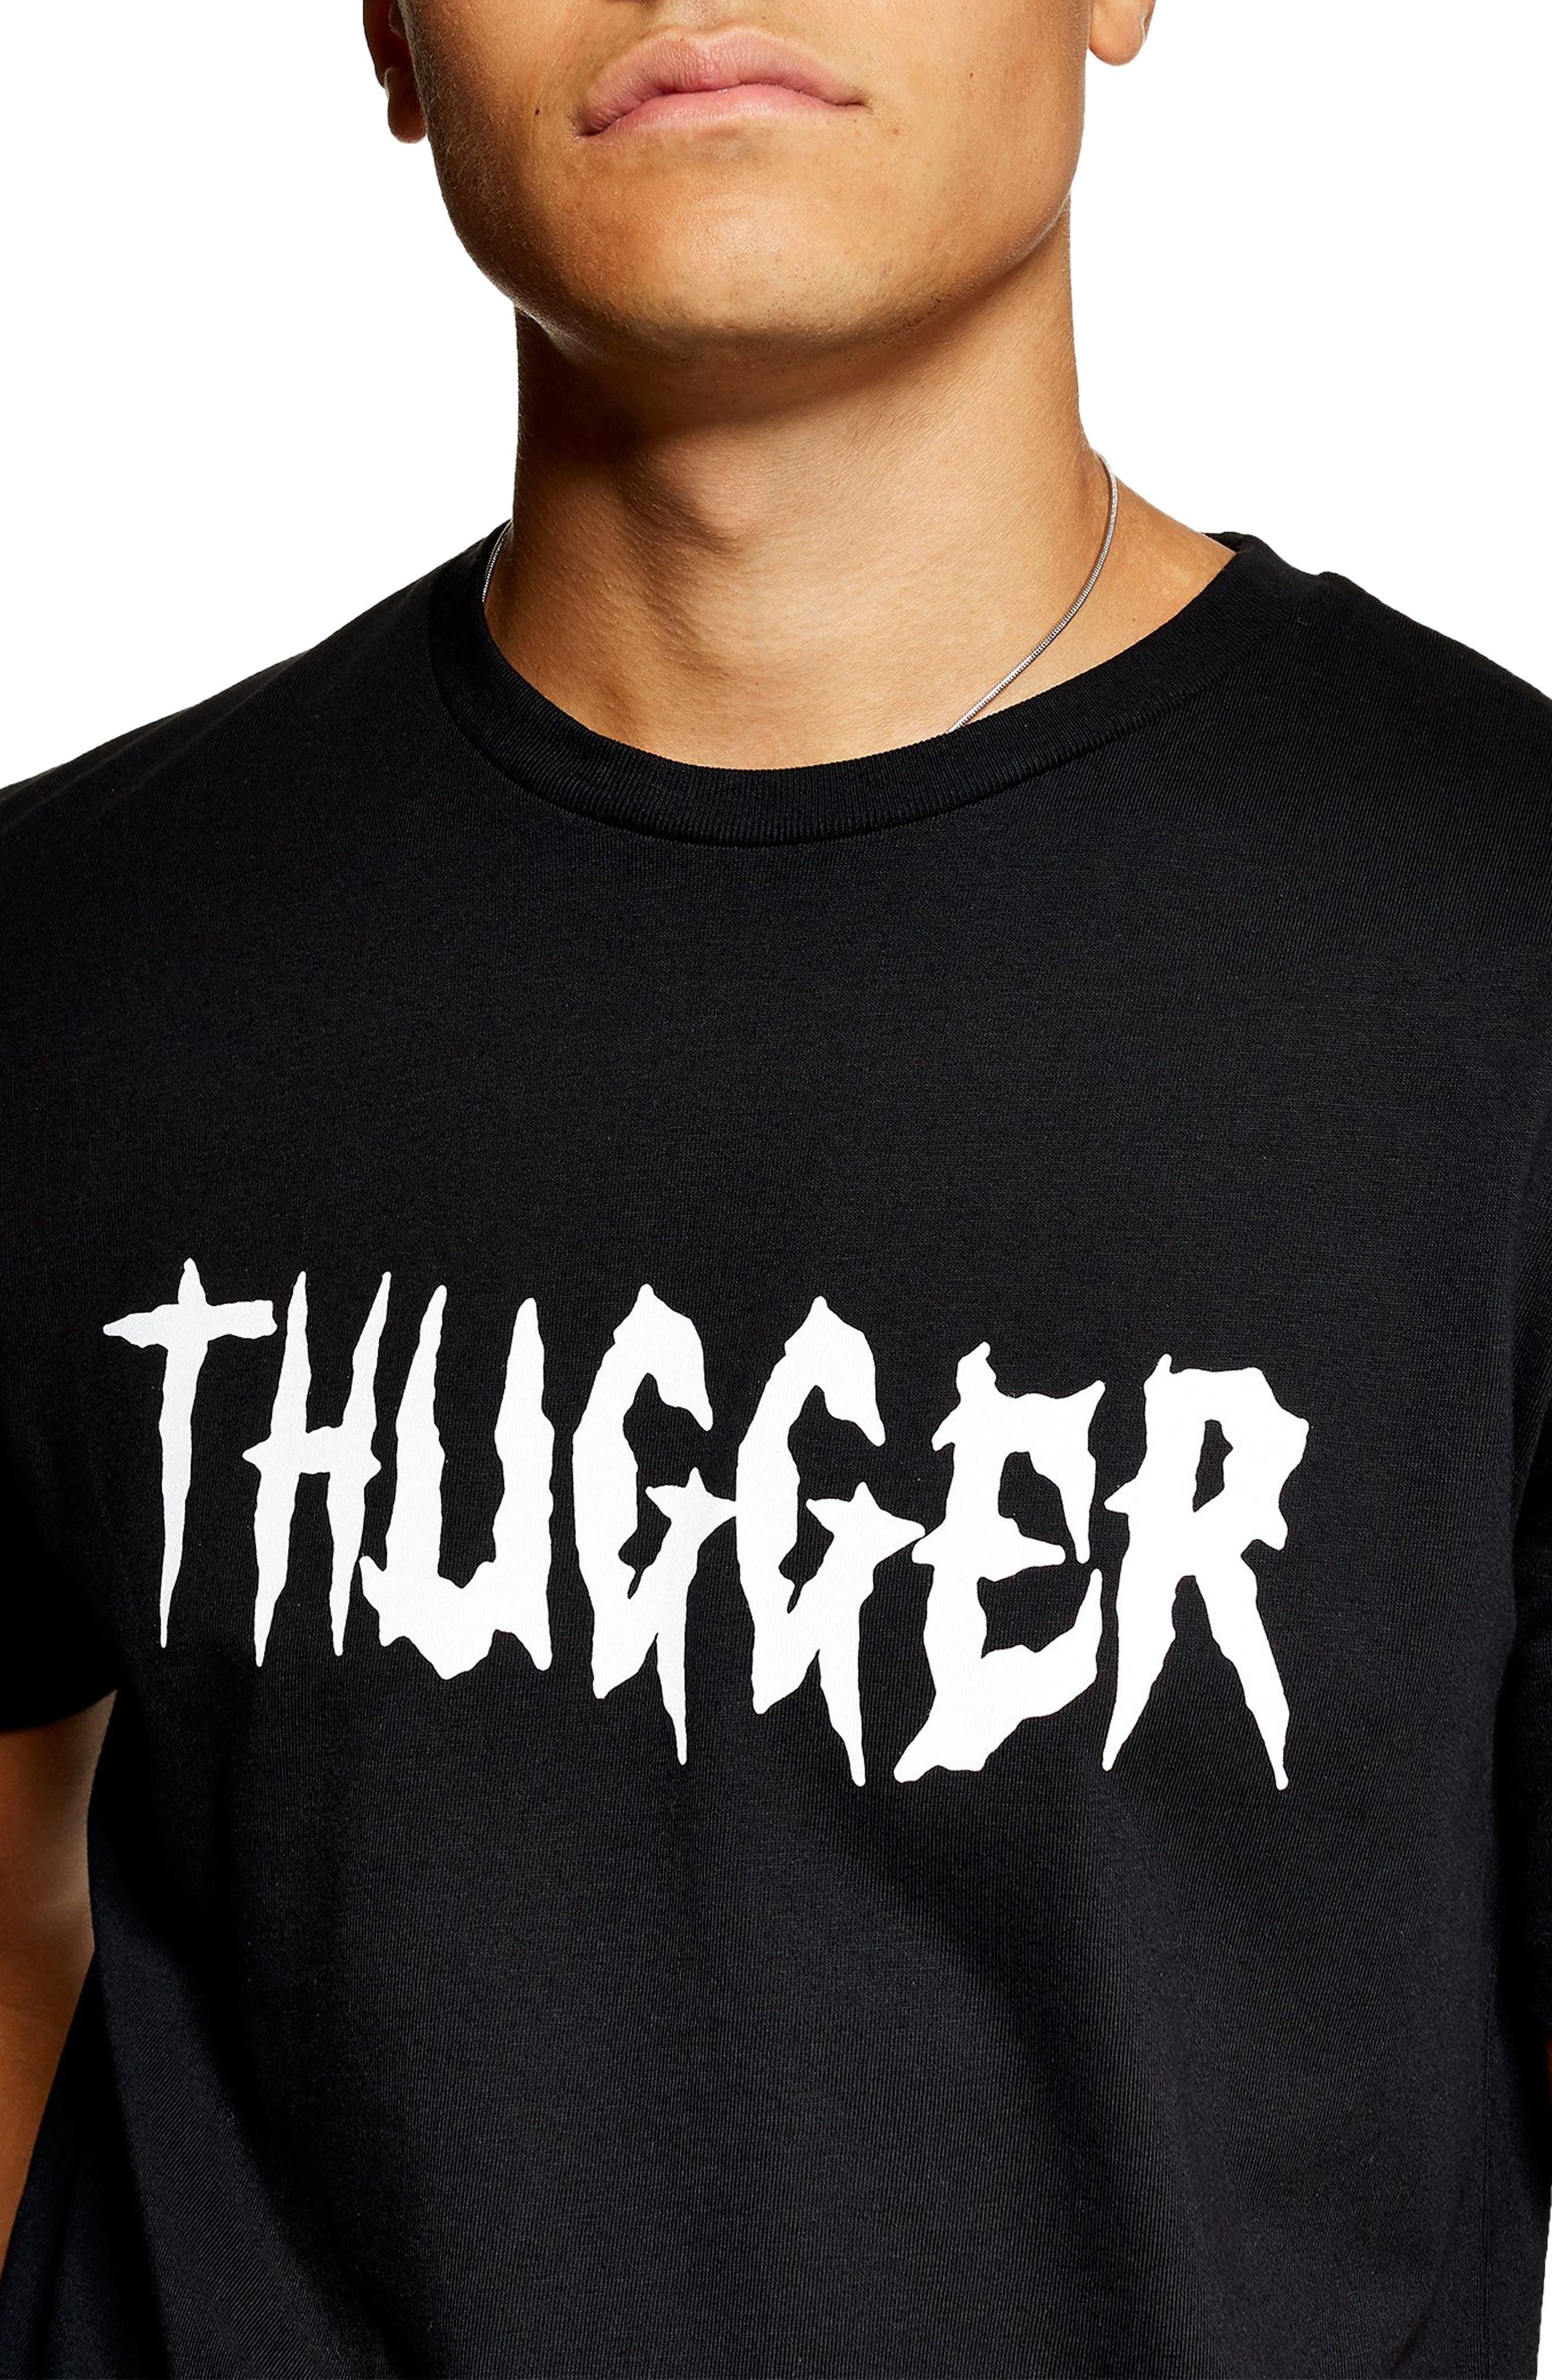 Thugger Graphic T-Shirt,                             Alternate thumbnail 3, color,                             001